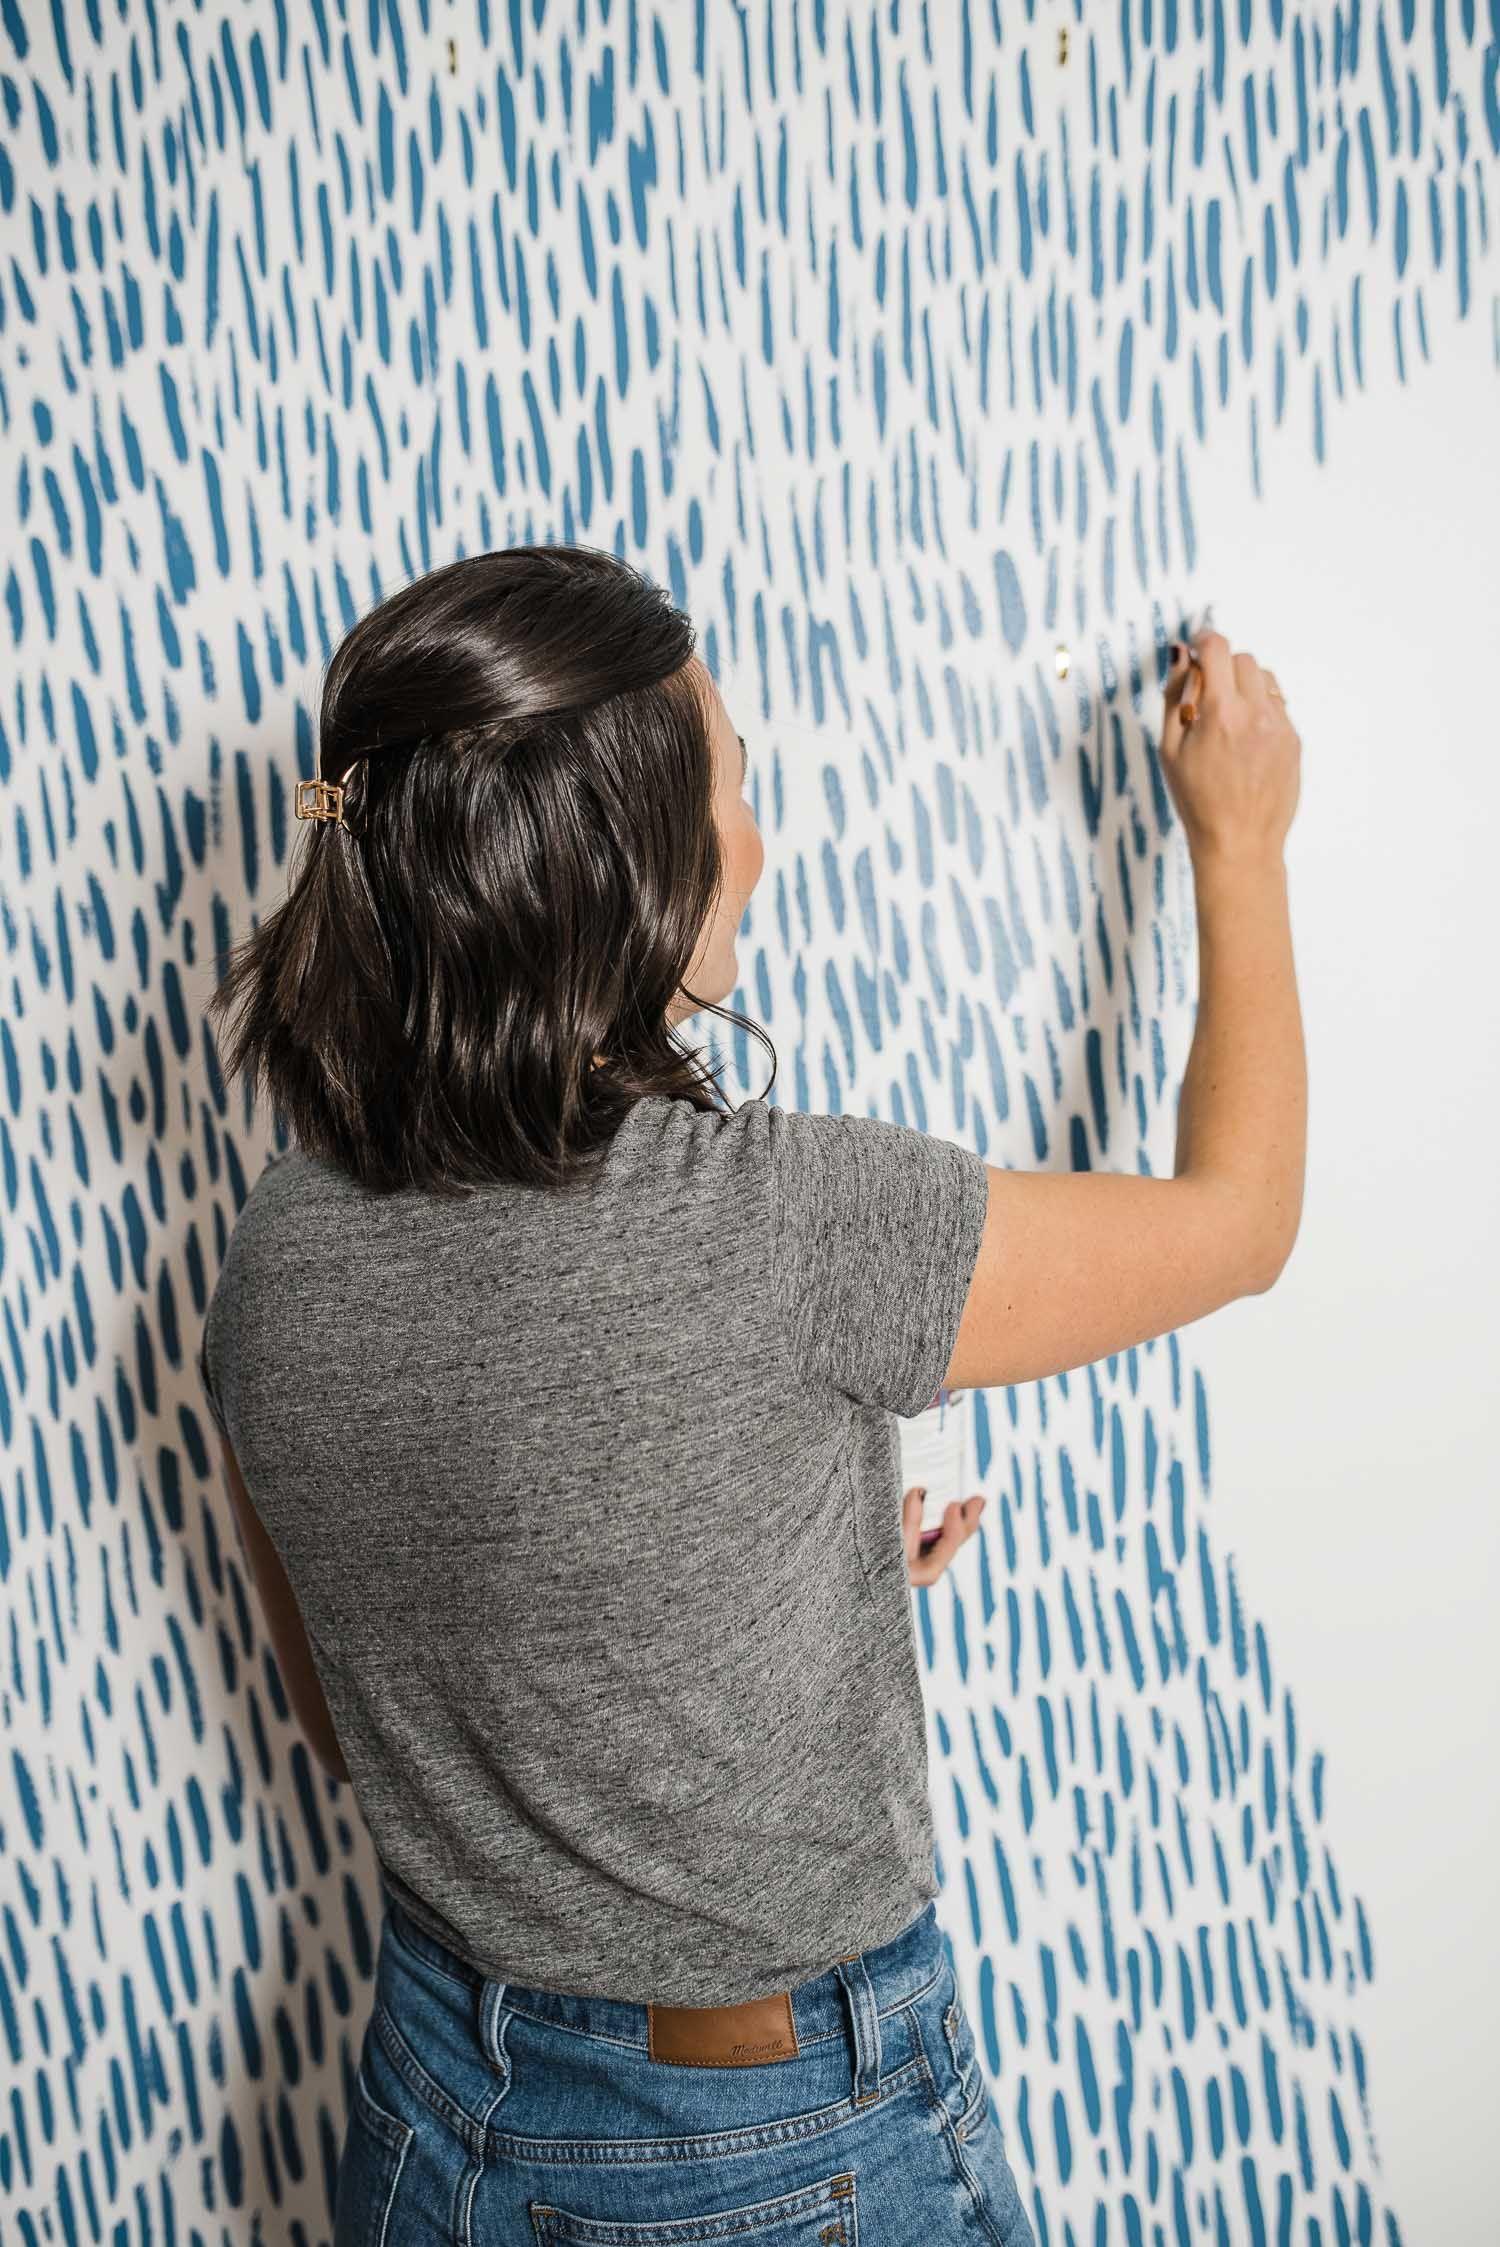 Diy brushstroke accent wall tutorial diy wall painting